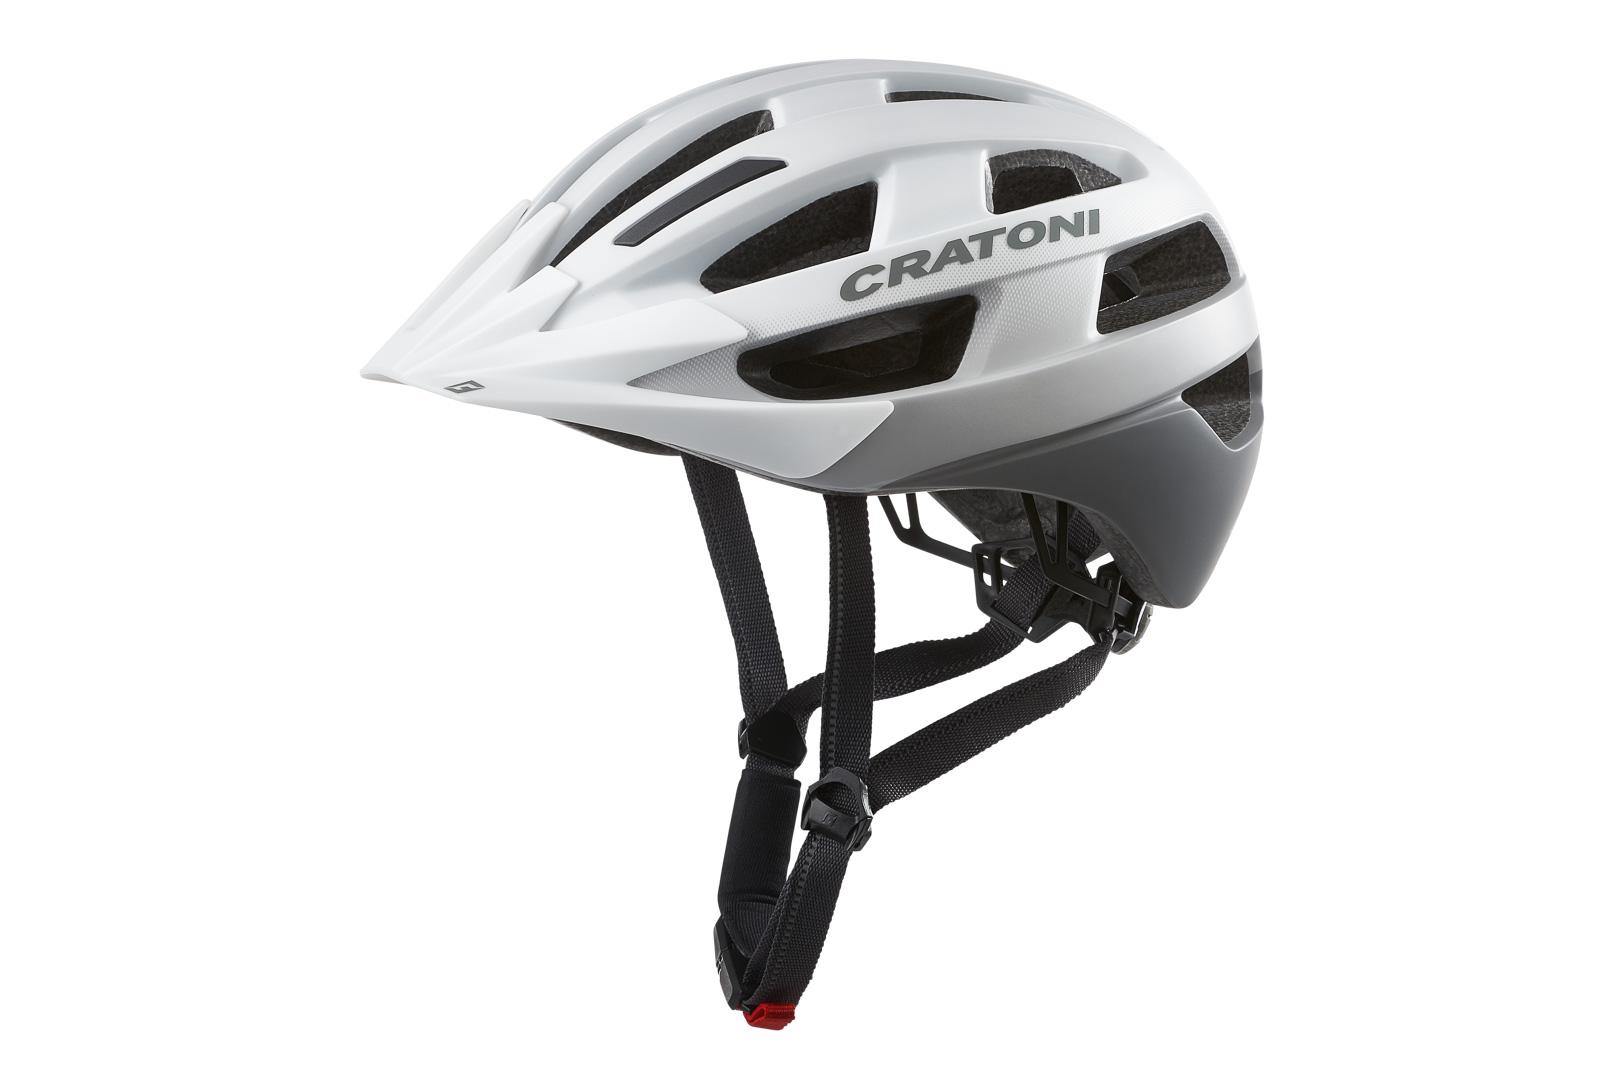 Fahrradhelm Cratoni Velo-X weiß matt